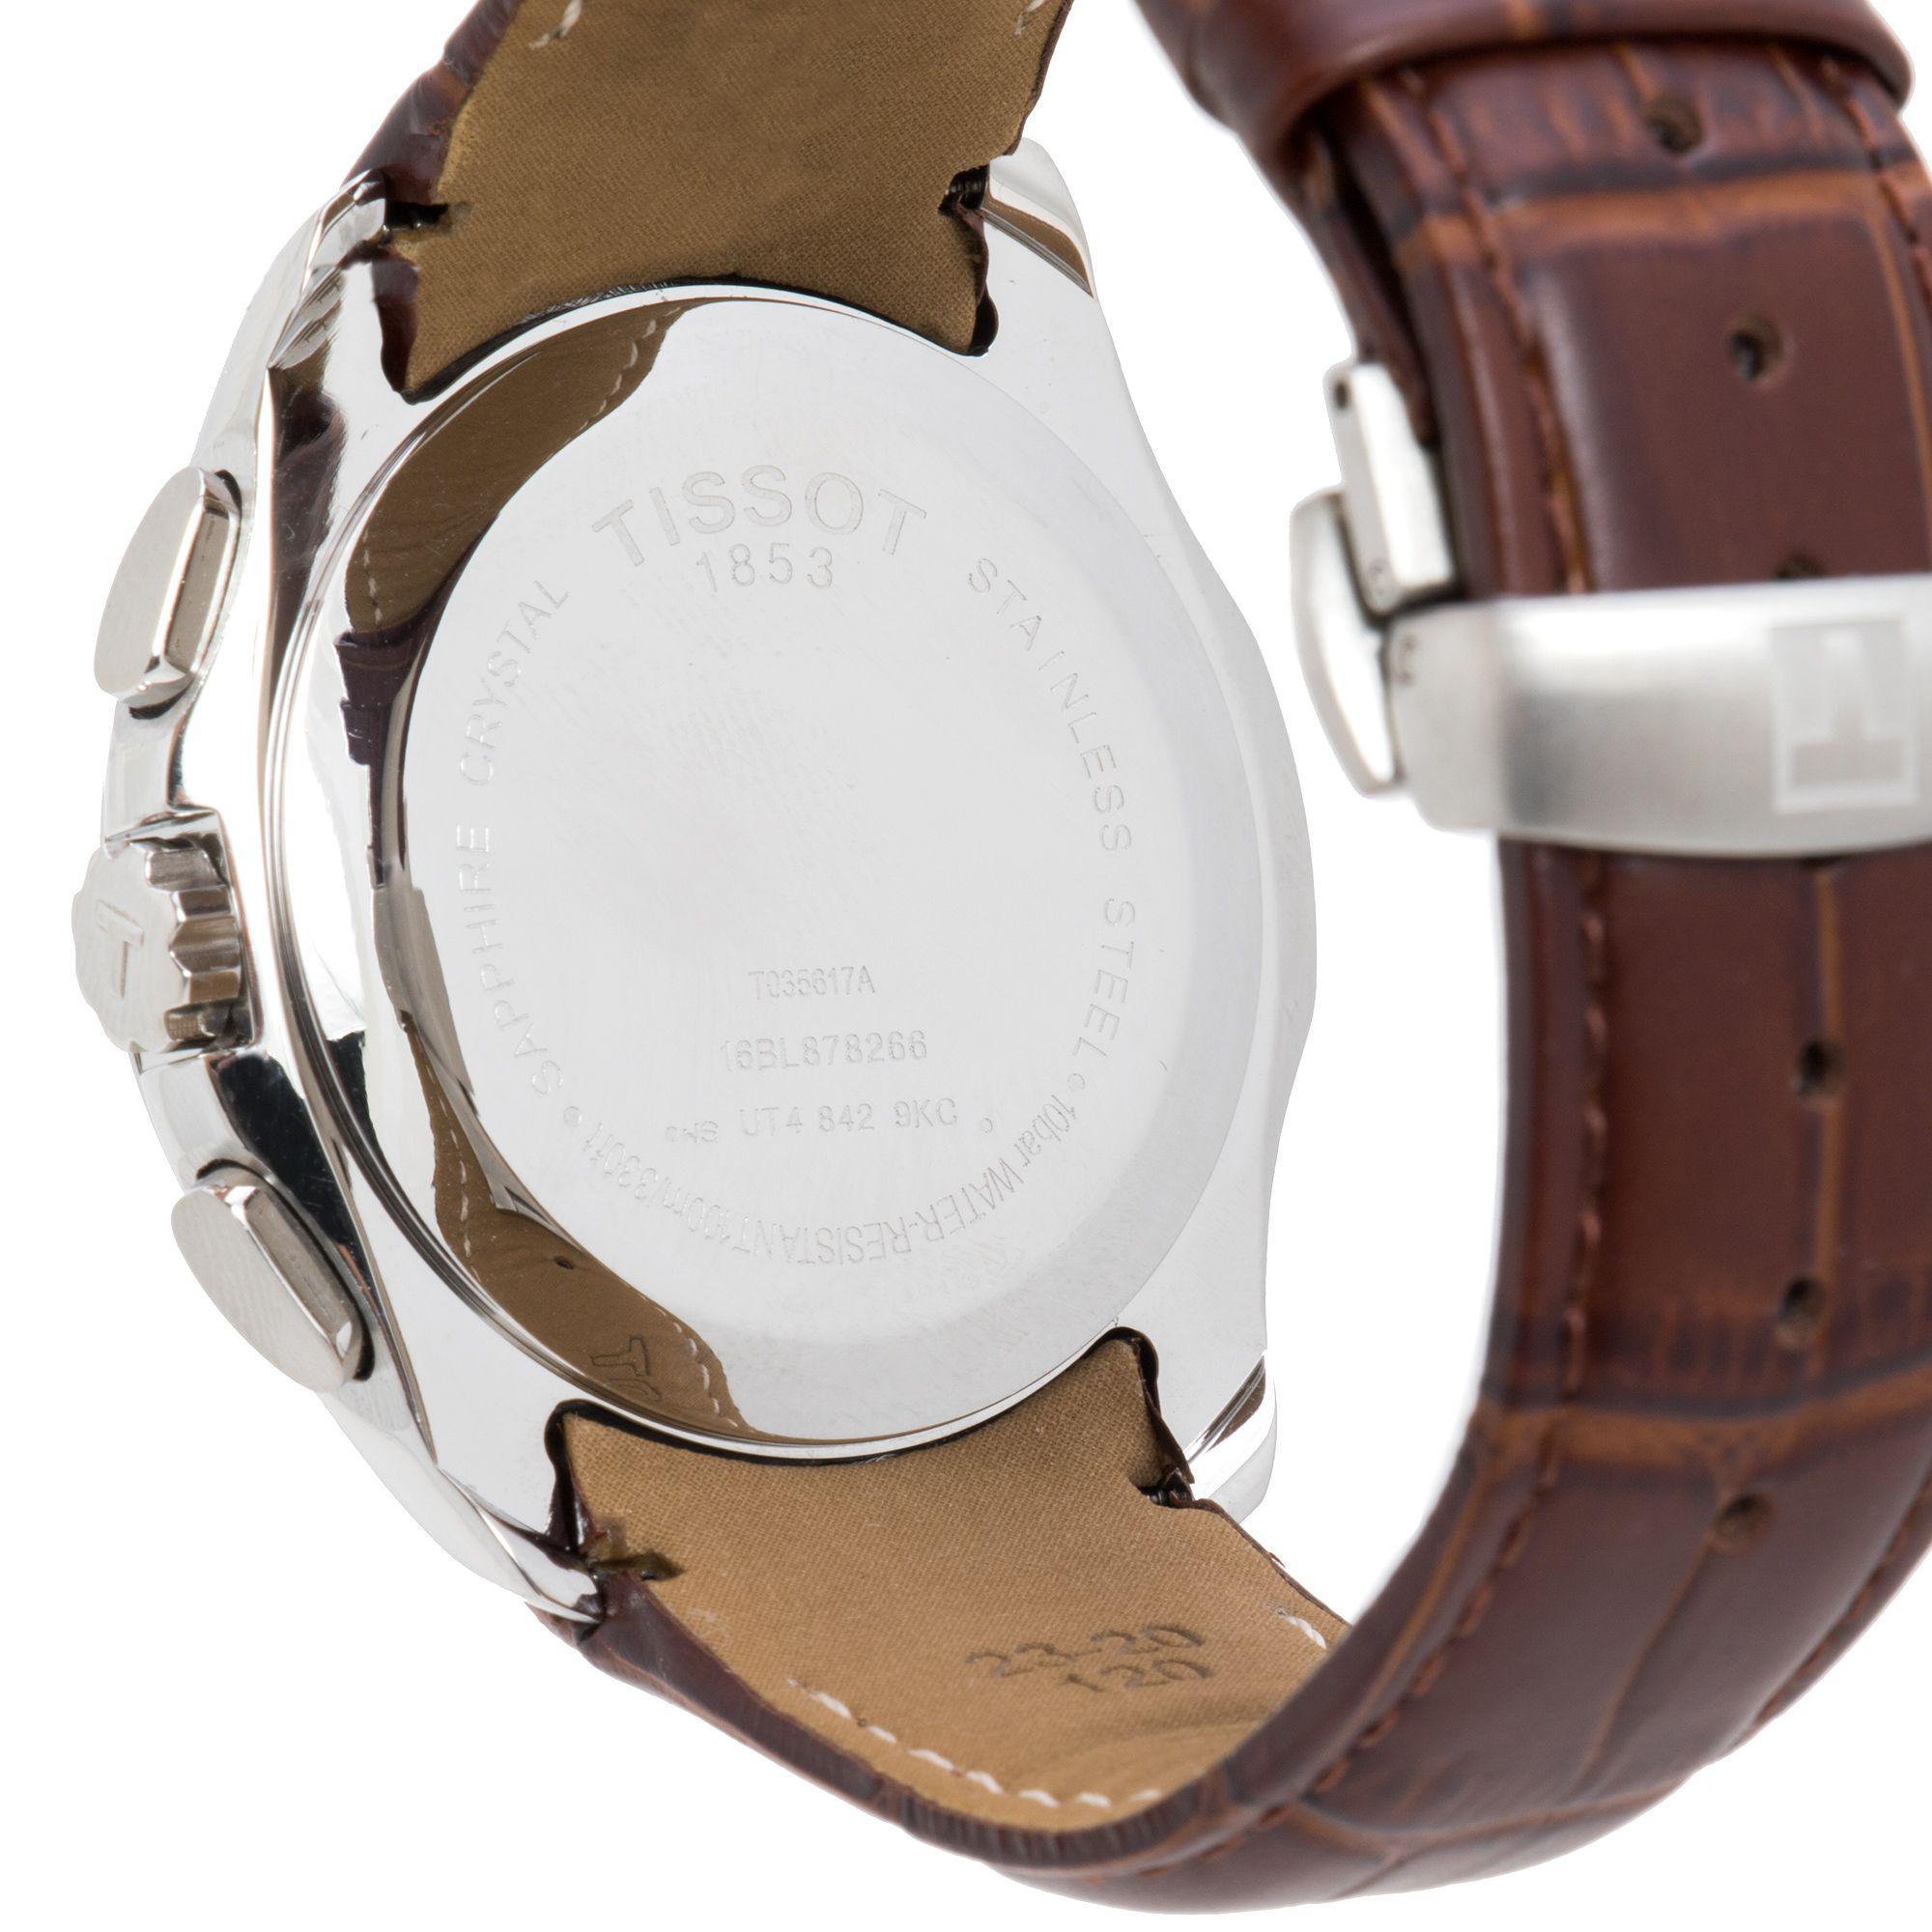 Lyst Tissot Couturier Chronograph Black Dial Mens Watch For Men T0356271605100 View Fullscreen